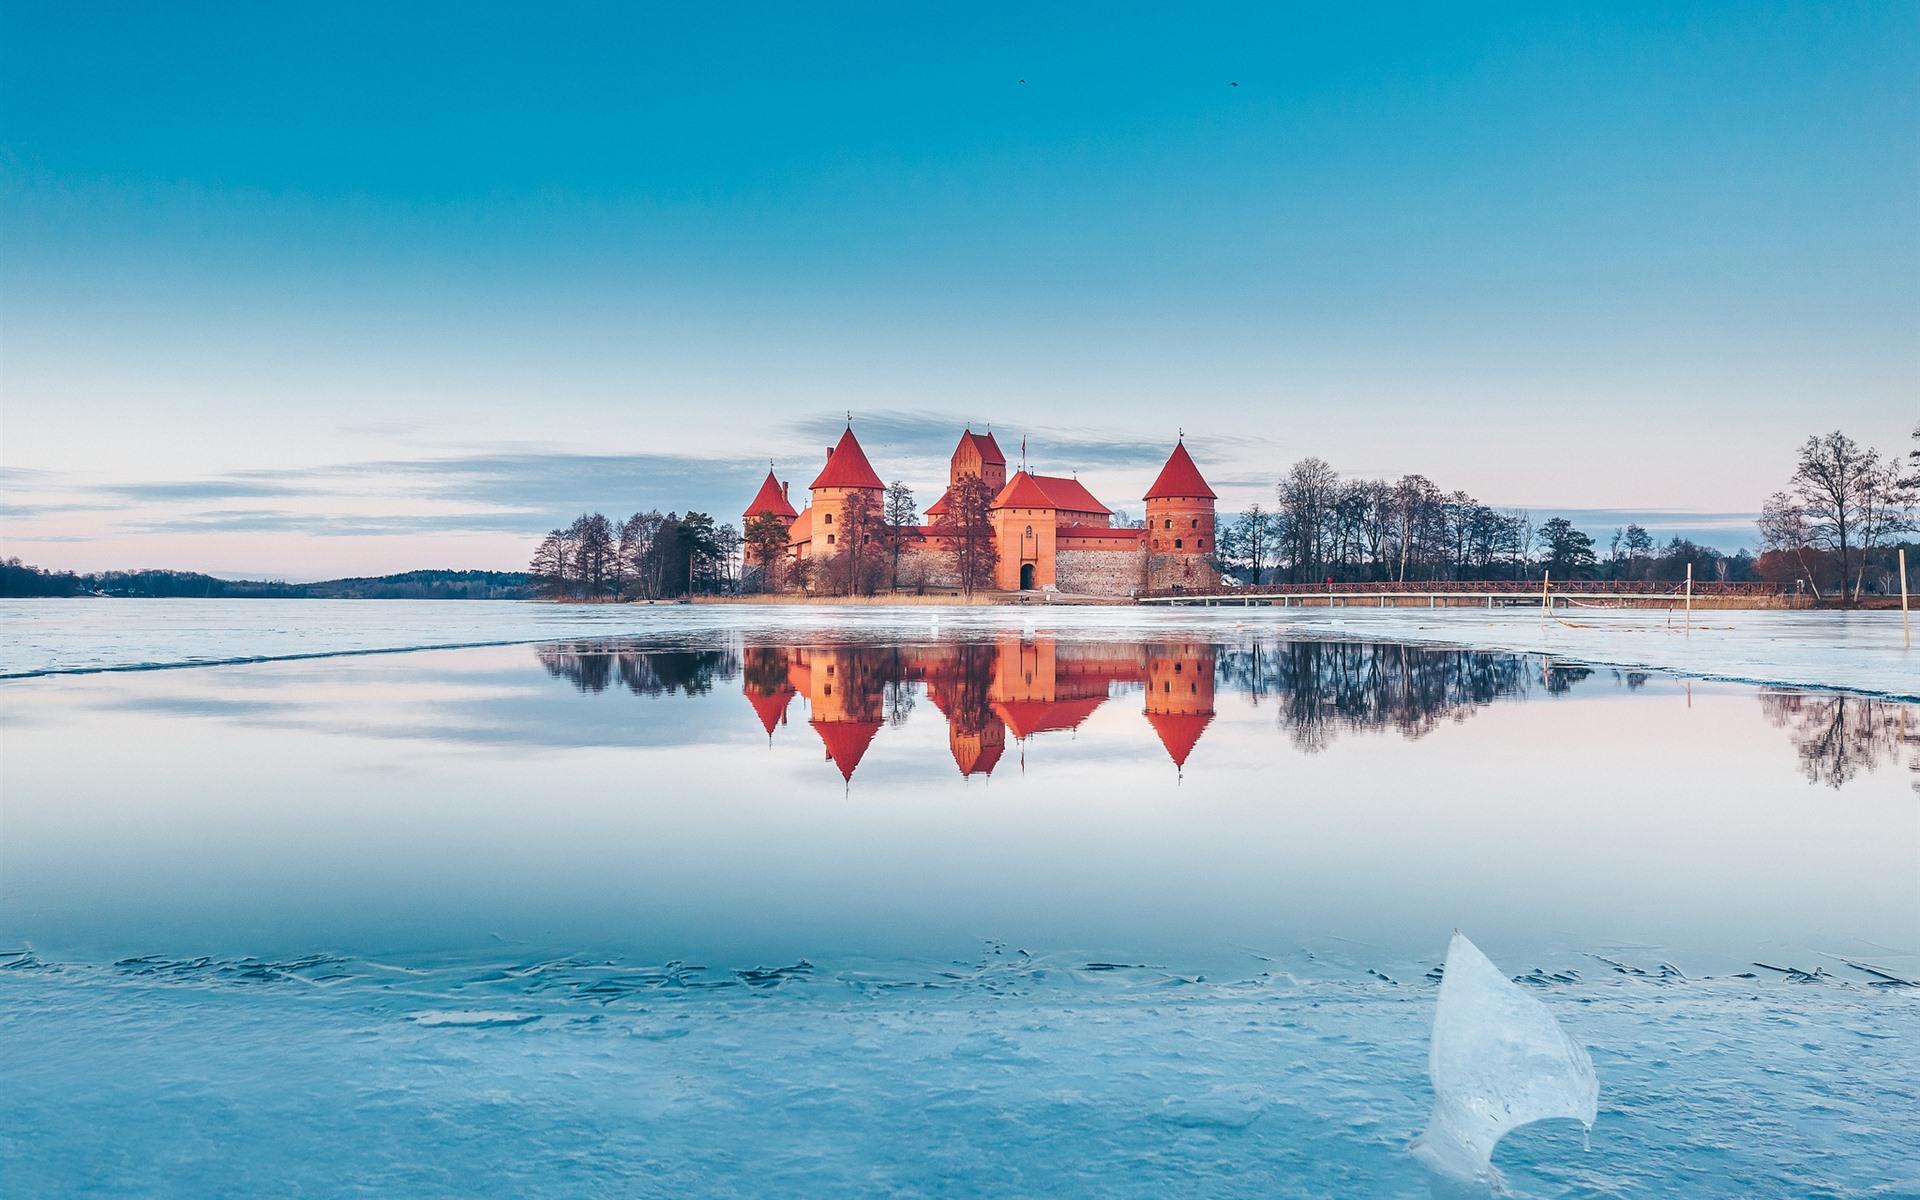 Wallpaper Trakai Lithuania Castle Lake Snow Ice Winter 1920x1200 Hd Picture Image